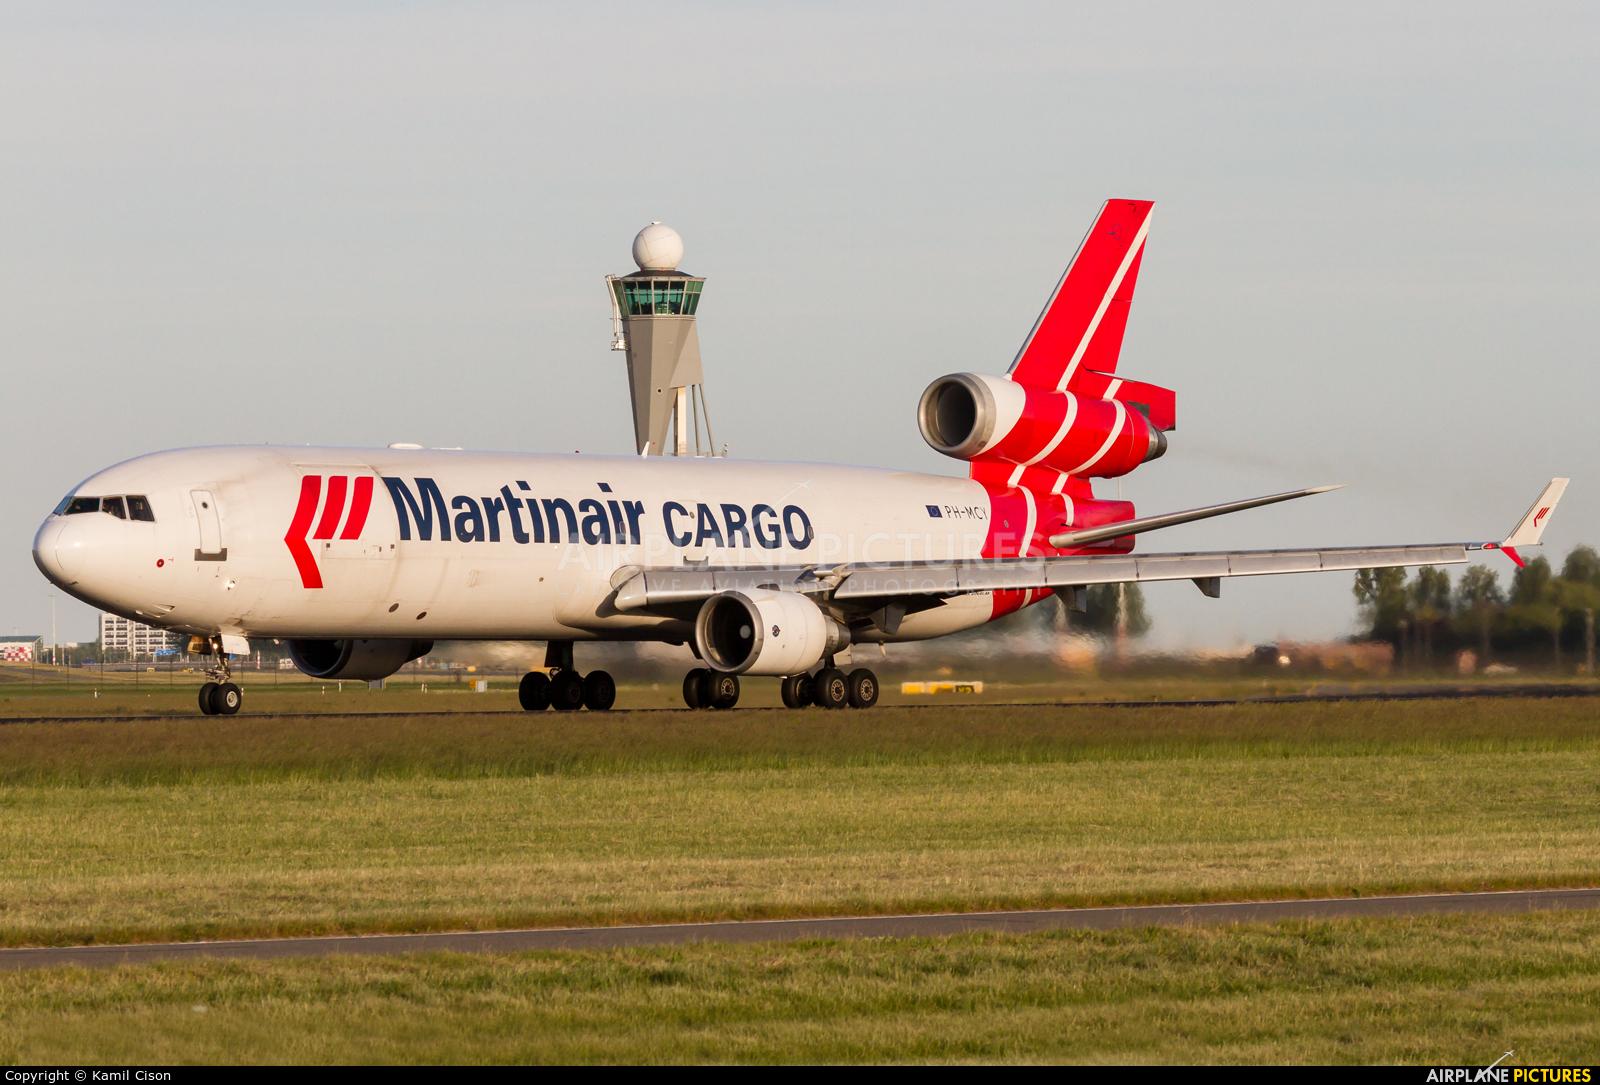 Martinair Cargo PH-MCY aircraft at Amsterdam - Schiphol